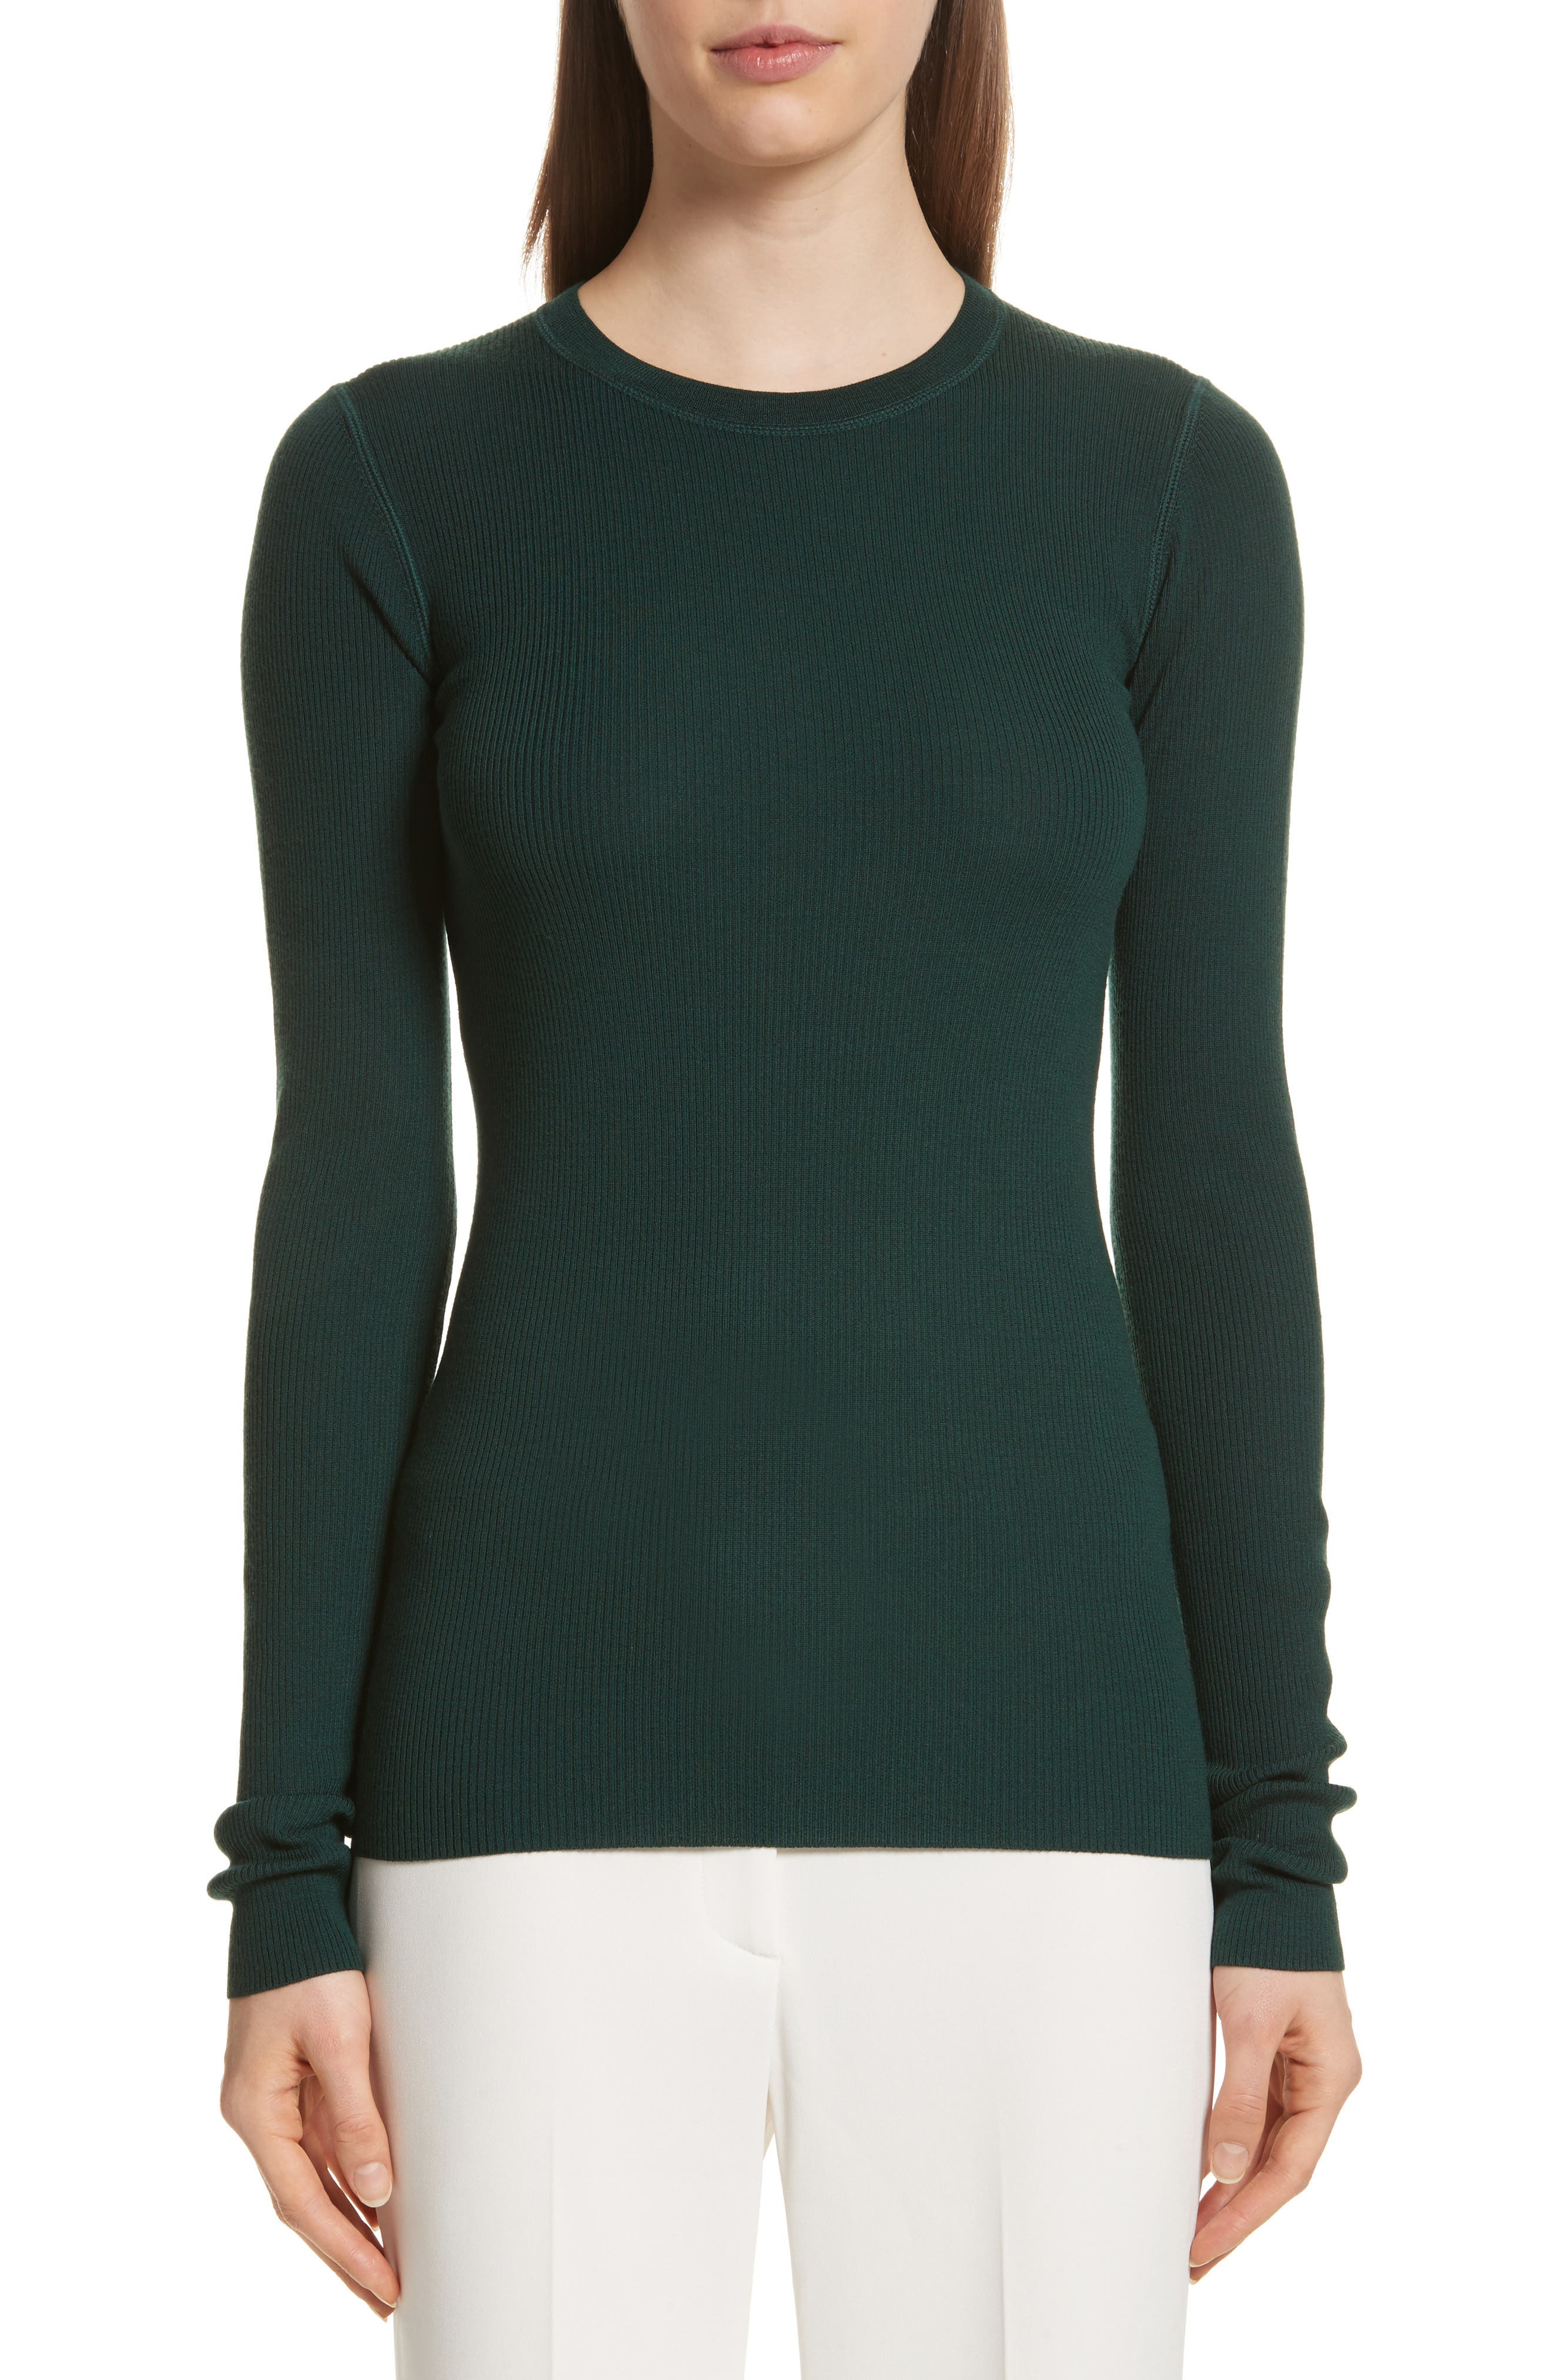 Mirzi Ribbed Sweater,                             Main thumbnail 1, color,                             308